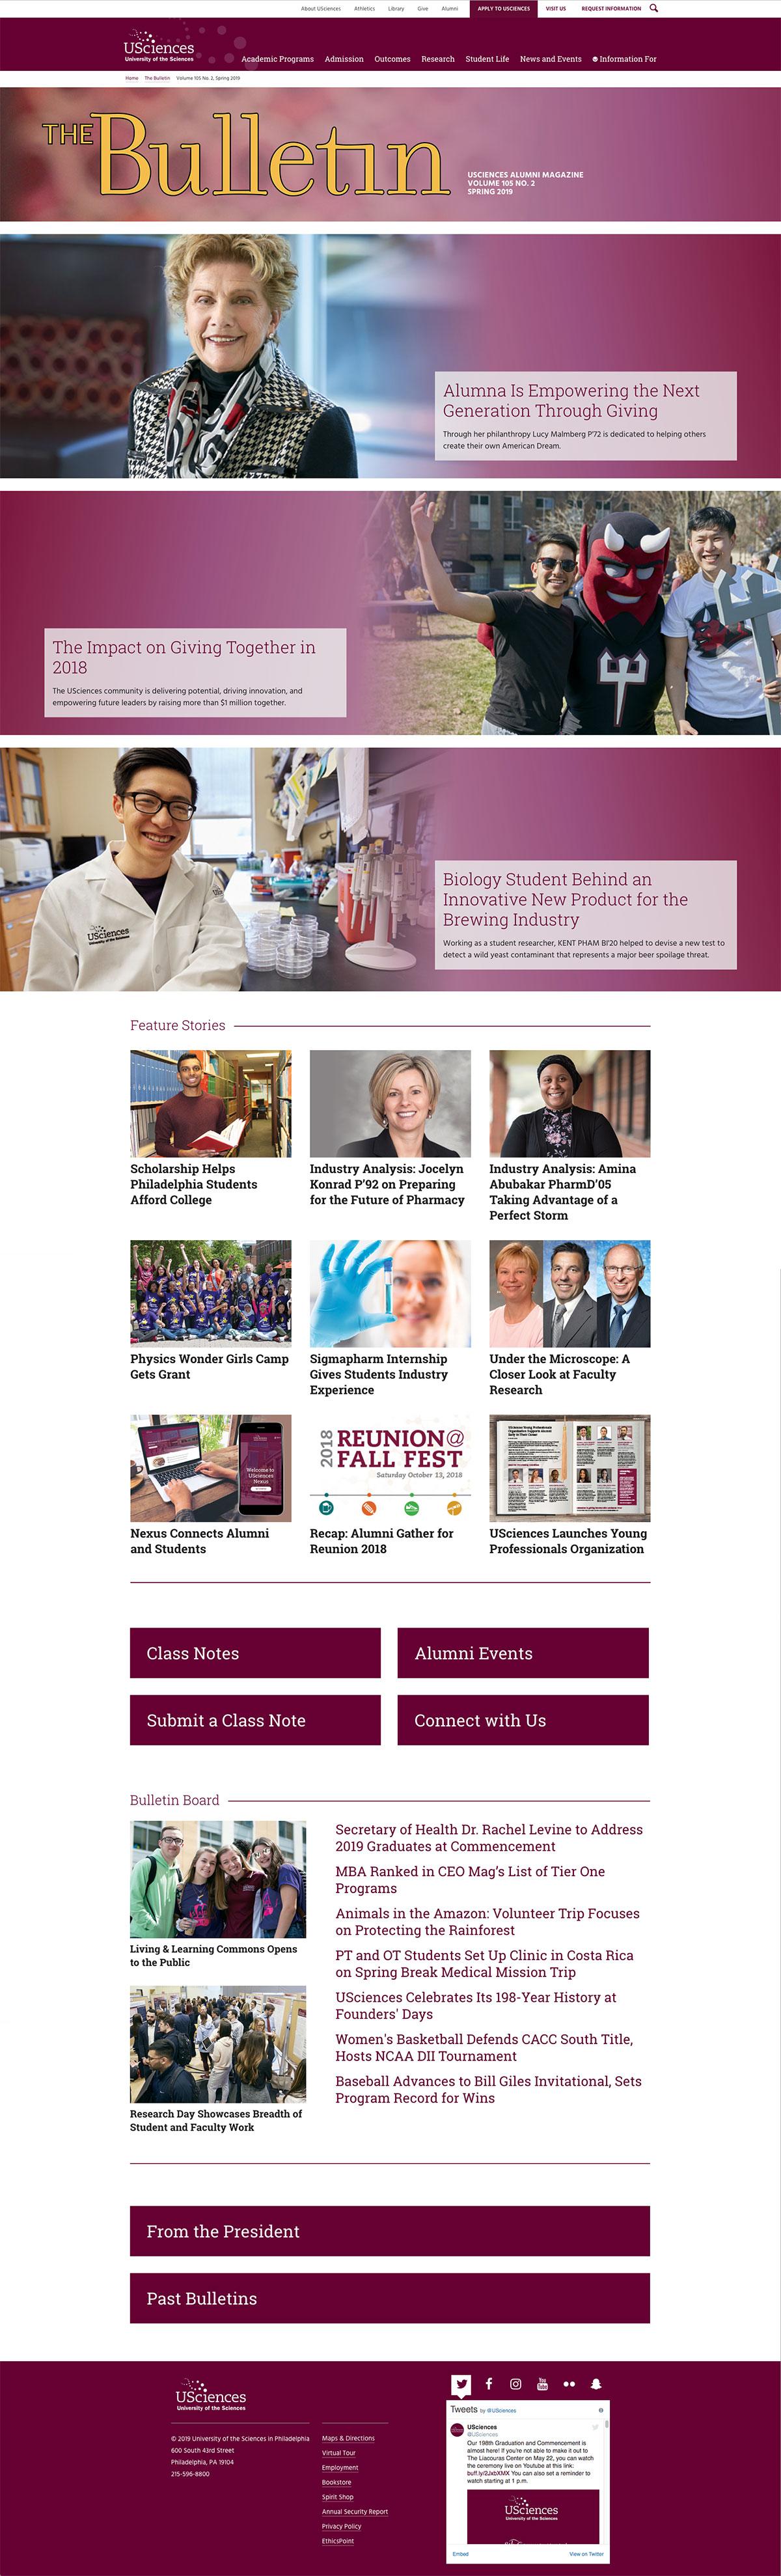 The Bulletin Online desktop view